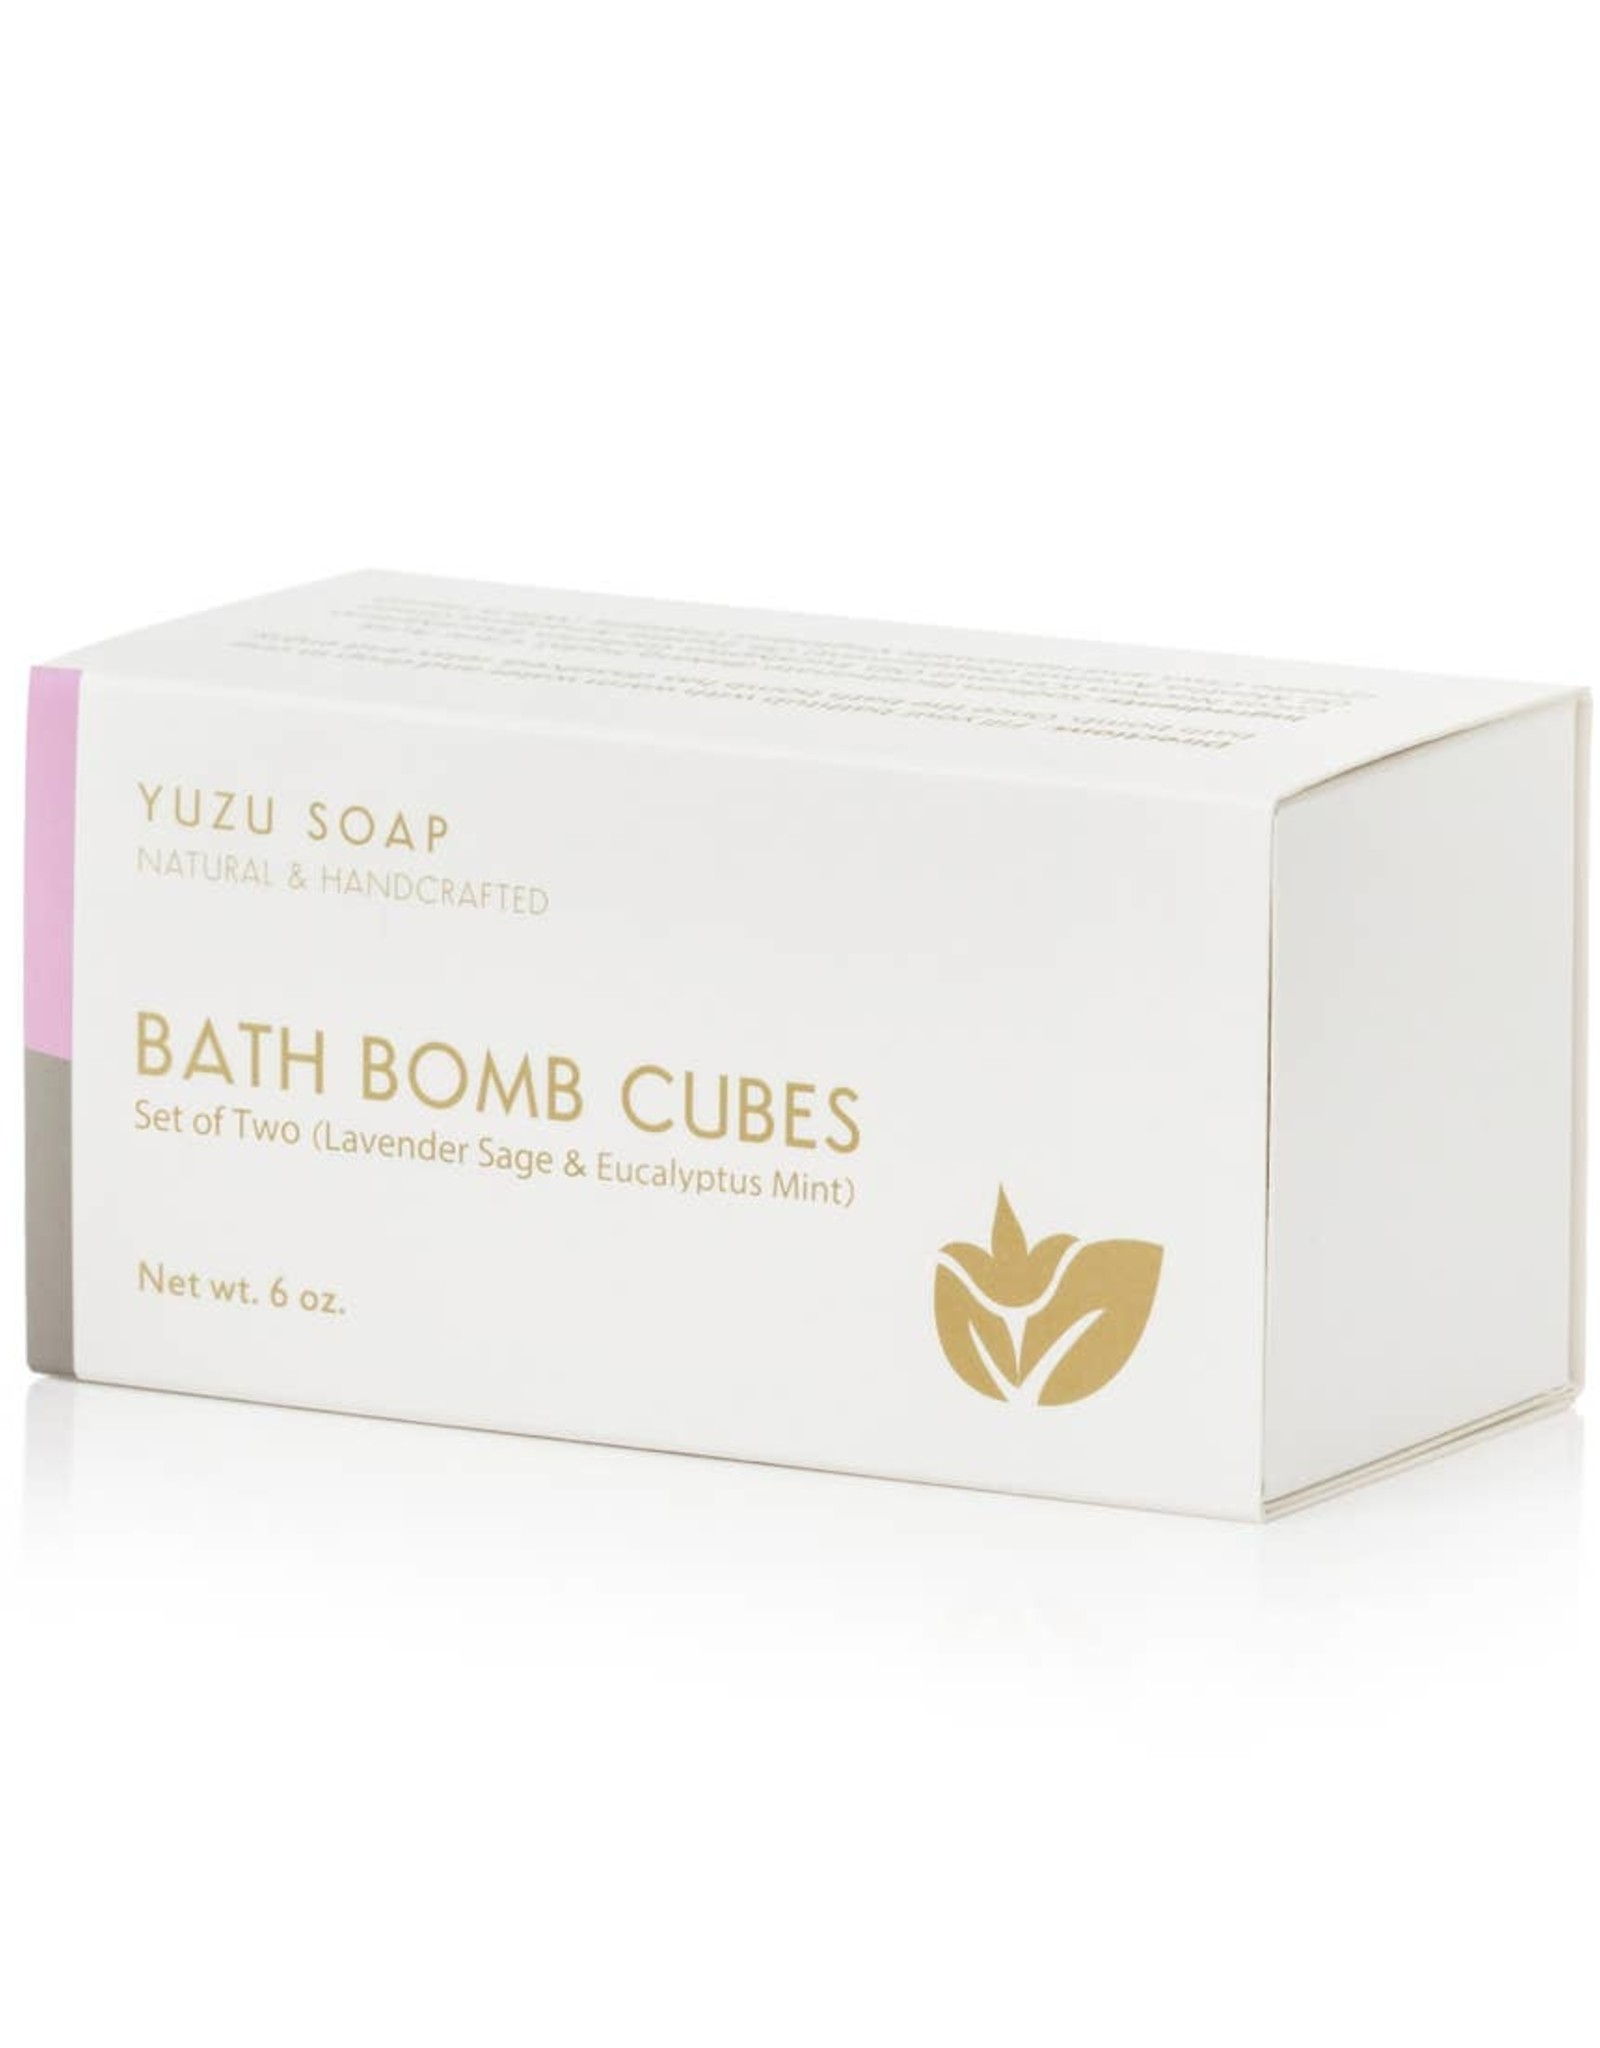 Yuzu Soap Yuzu Soap   Bath Bomb Cubes (Set of 2)